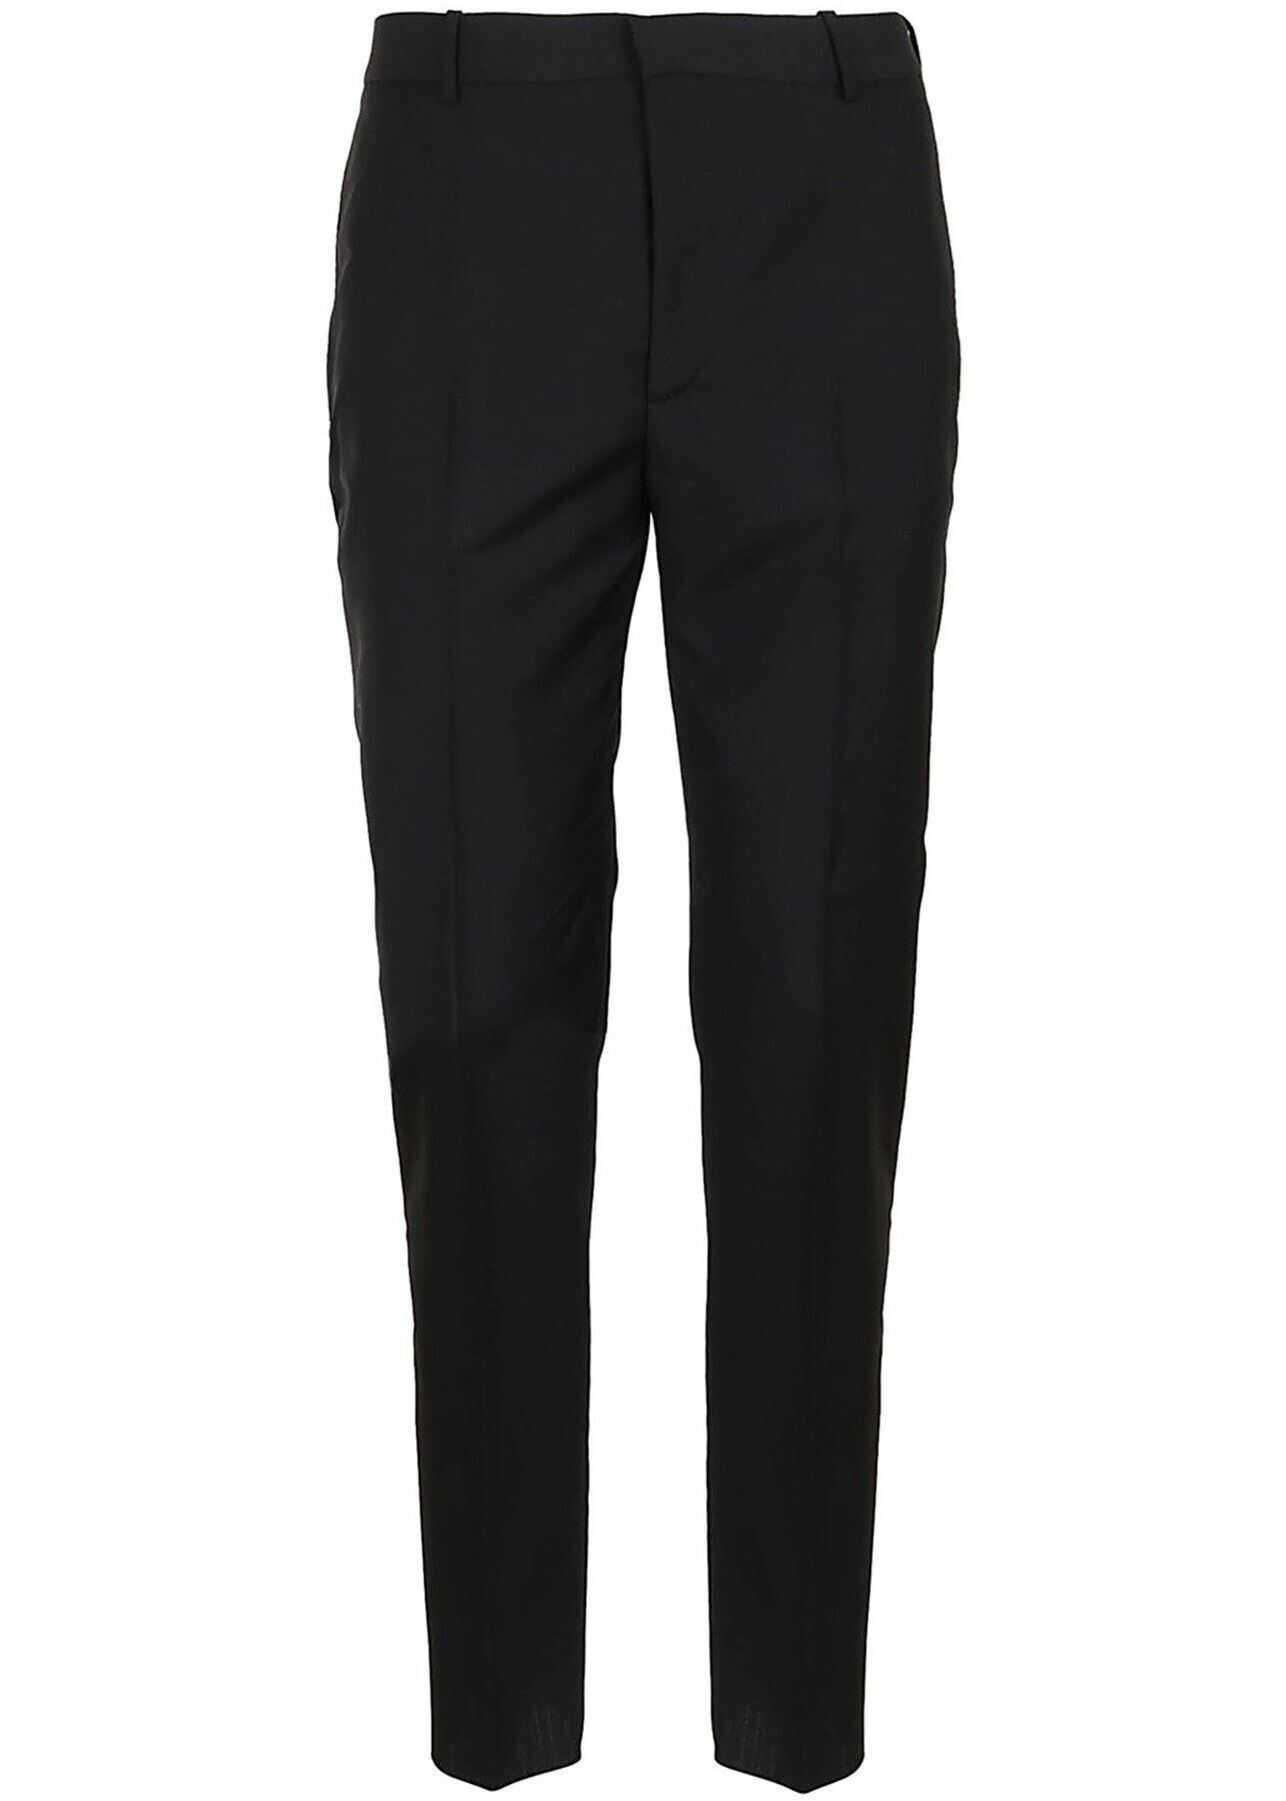 Alexander McQueen Wool Blend Pants In Black Black imagine